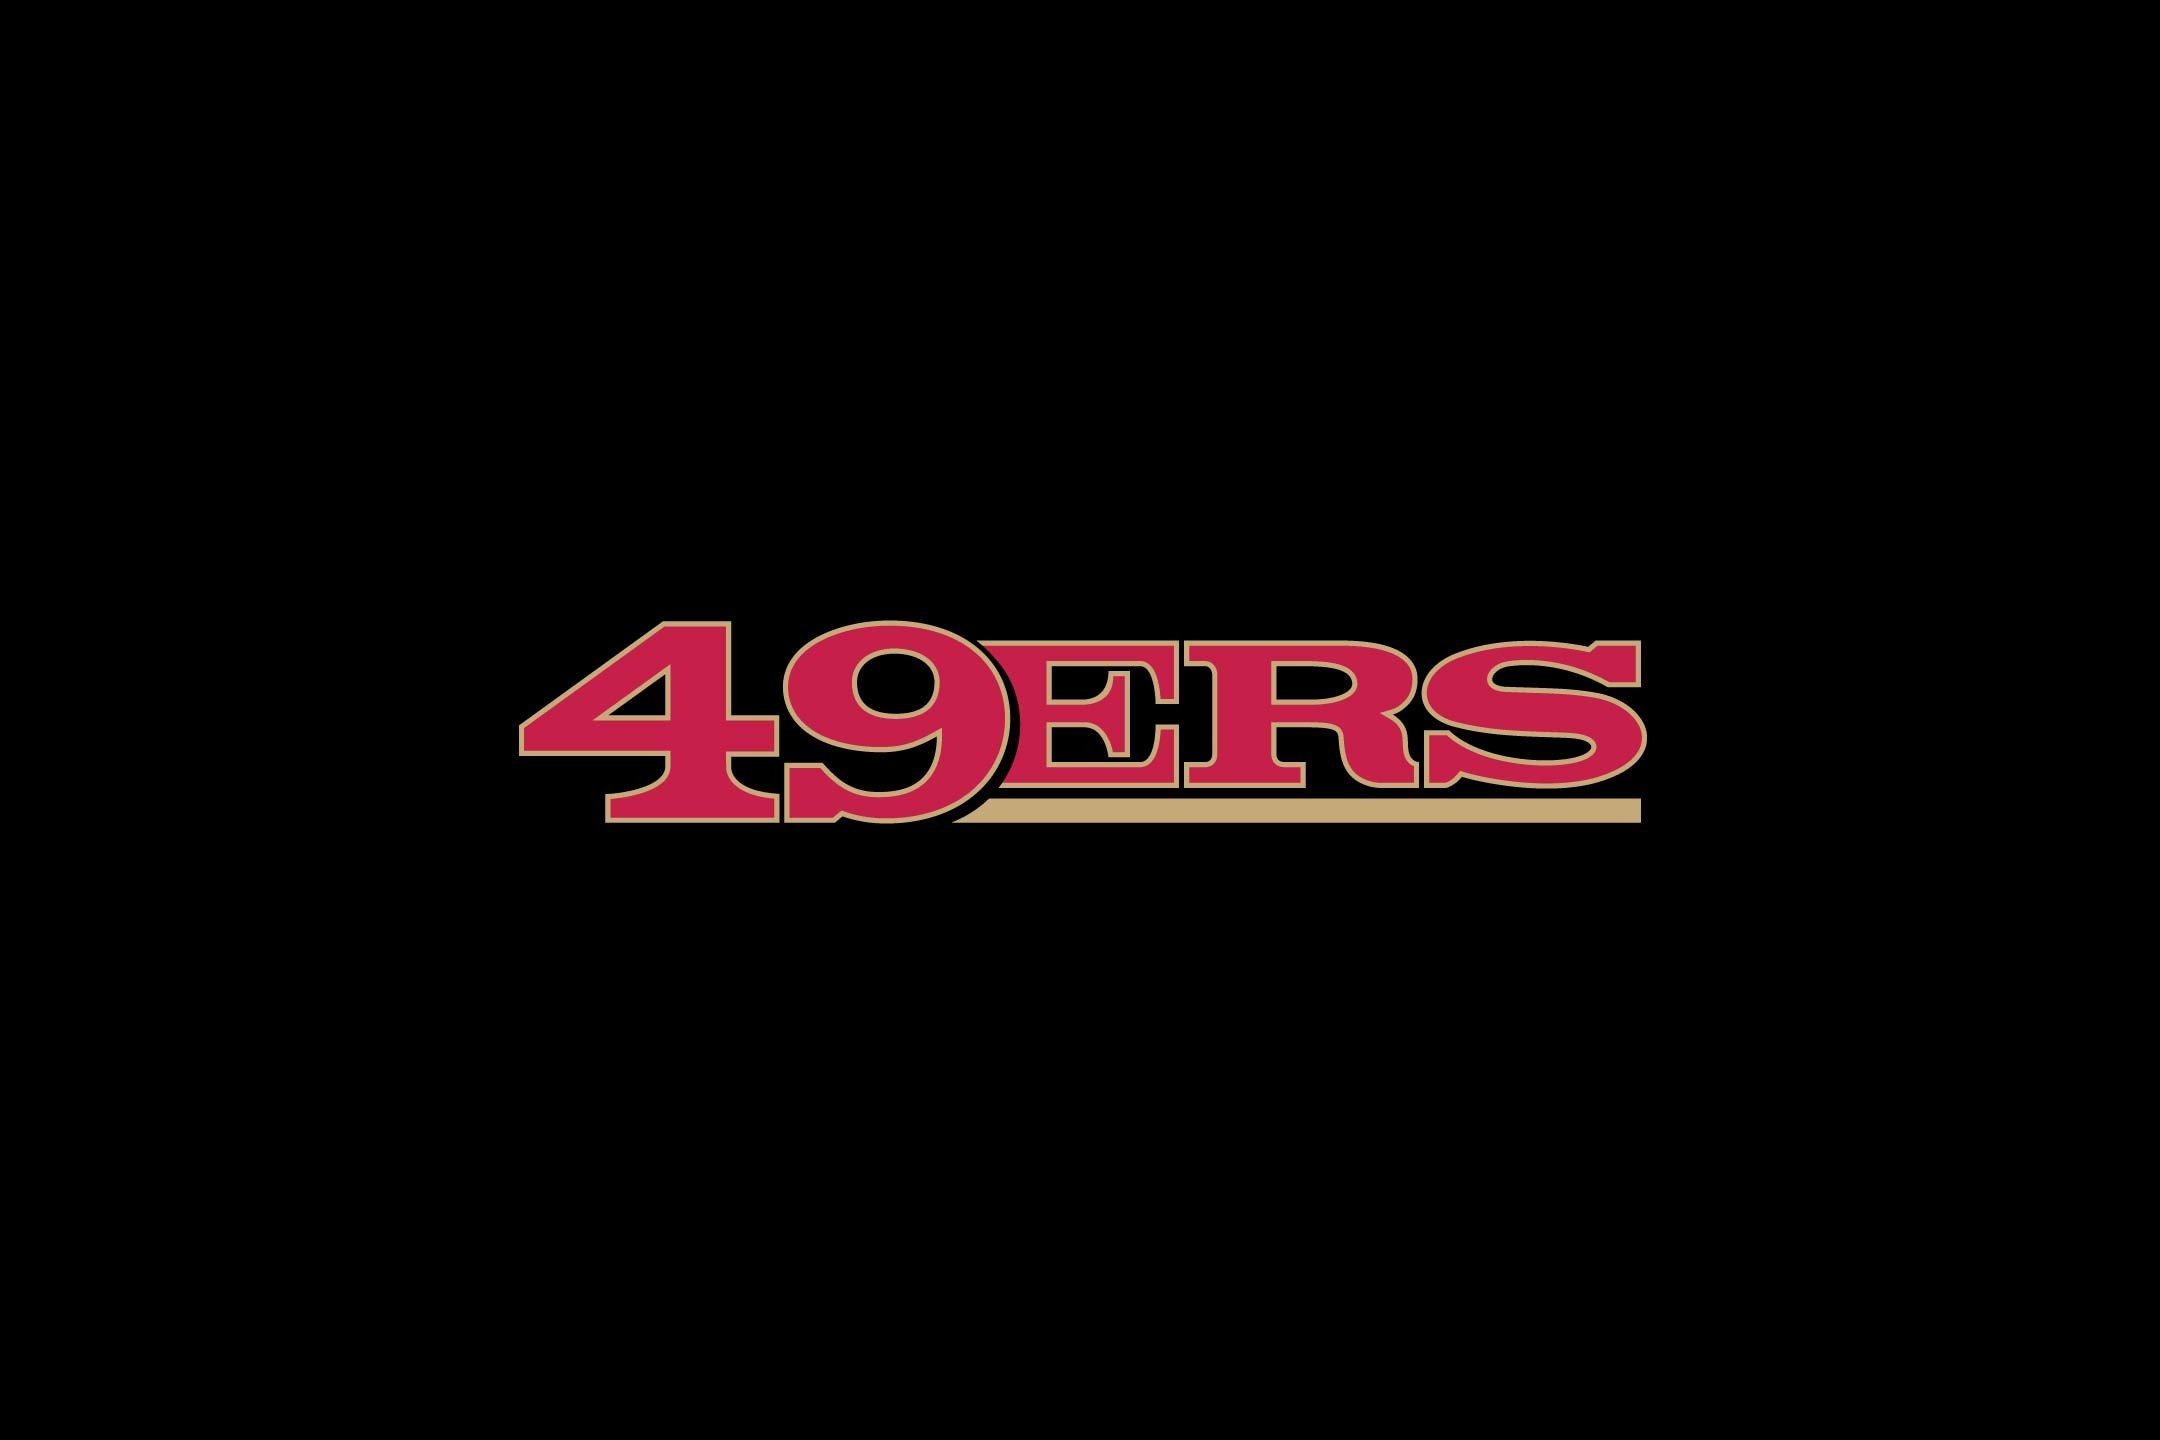 SAN FRANCISCO 49ers nfl football f wallpaper background